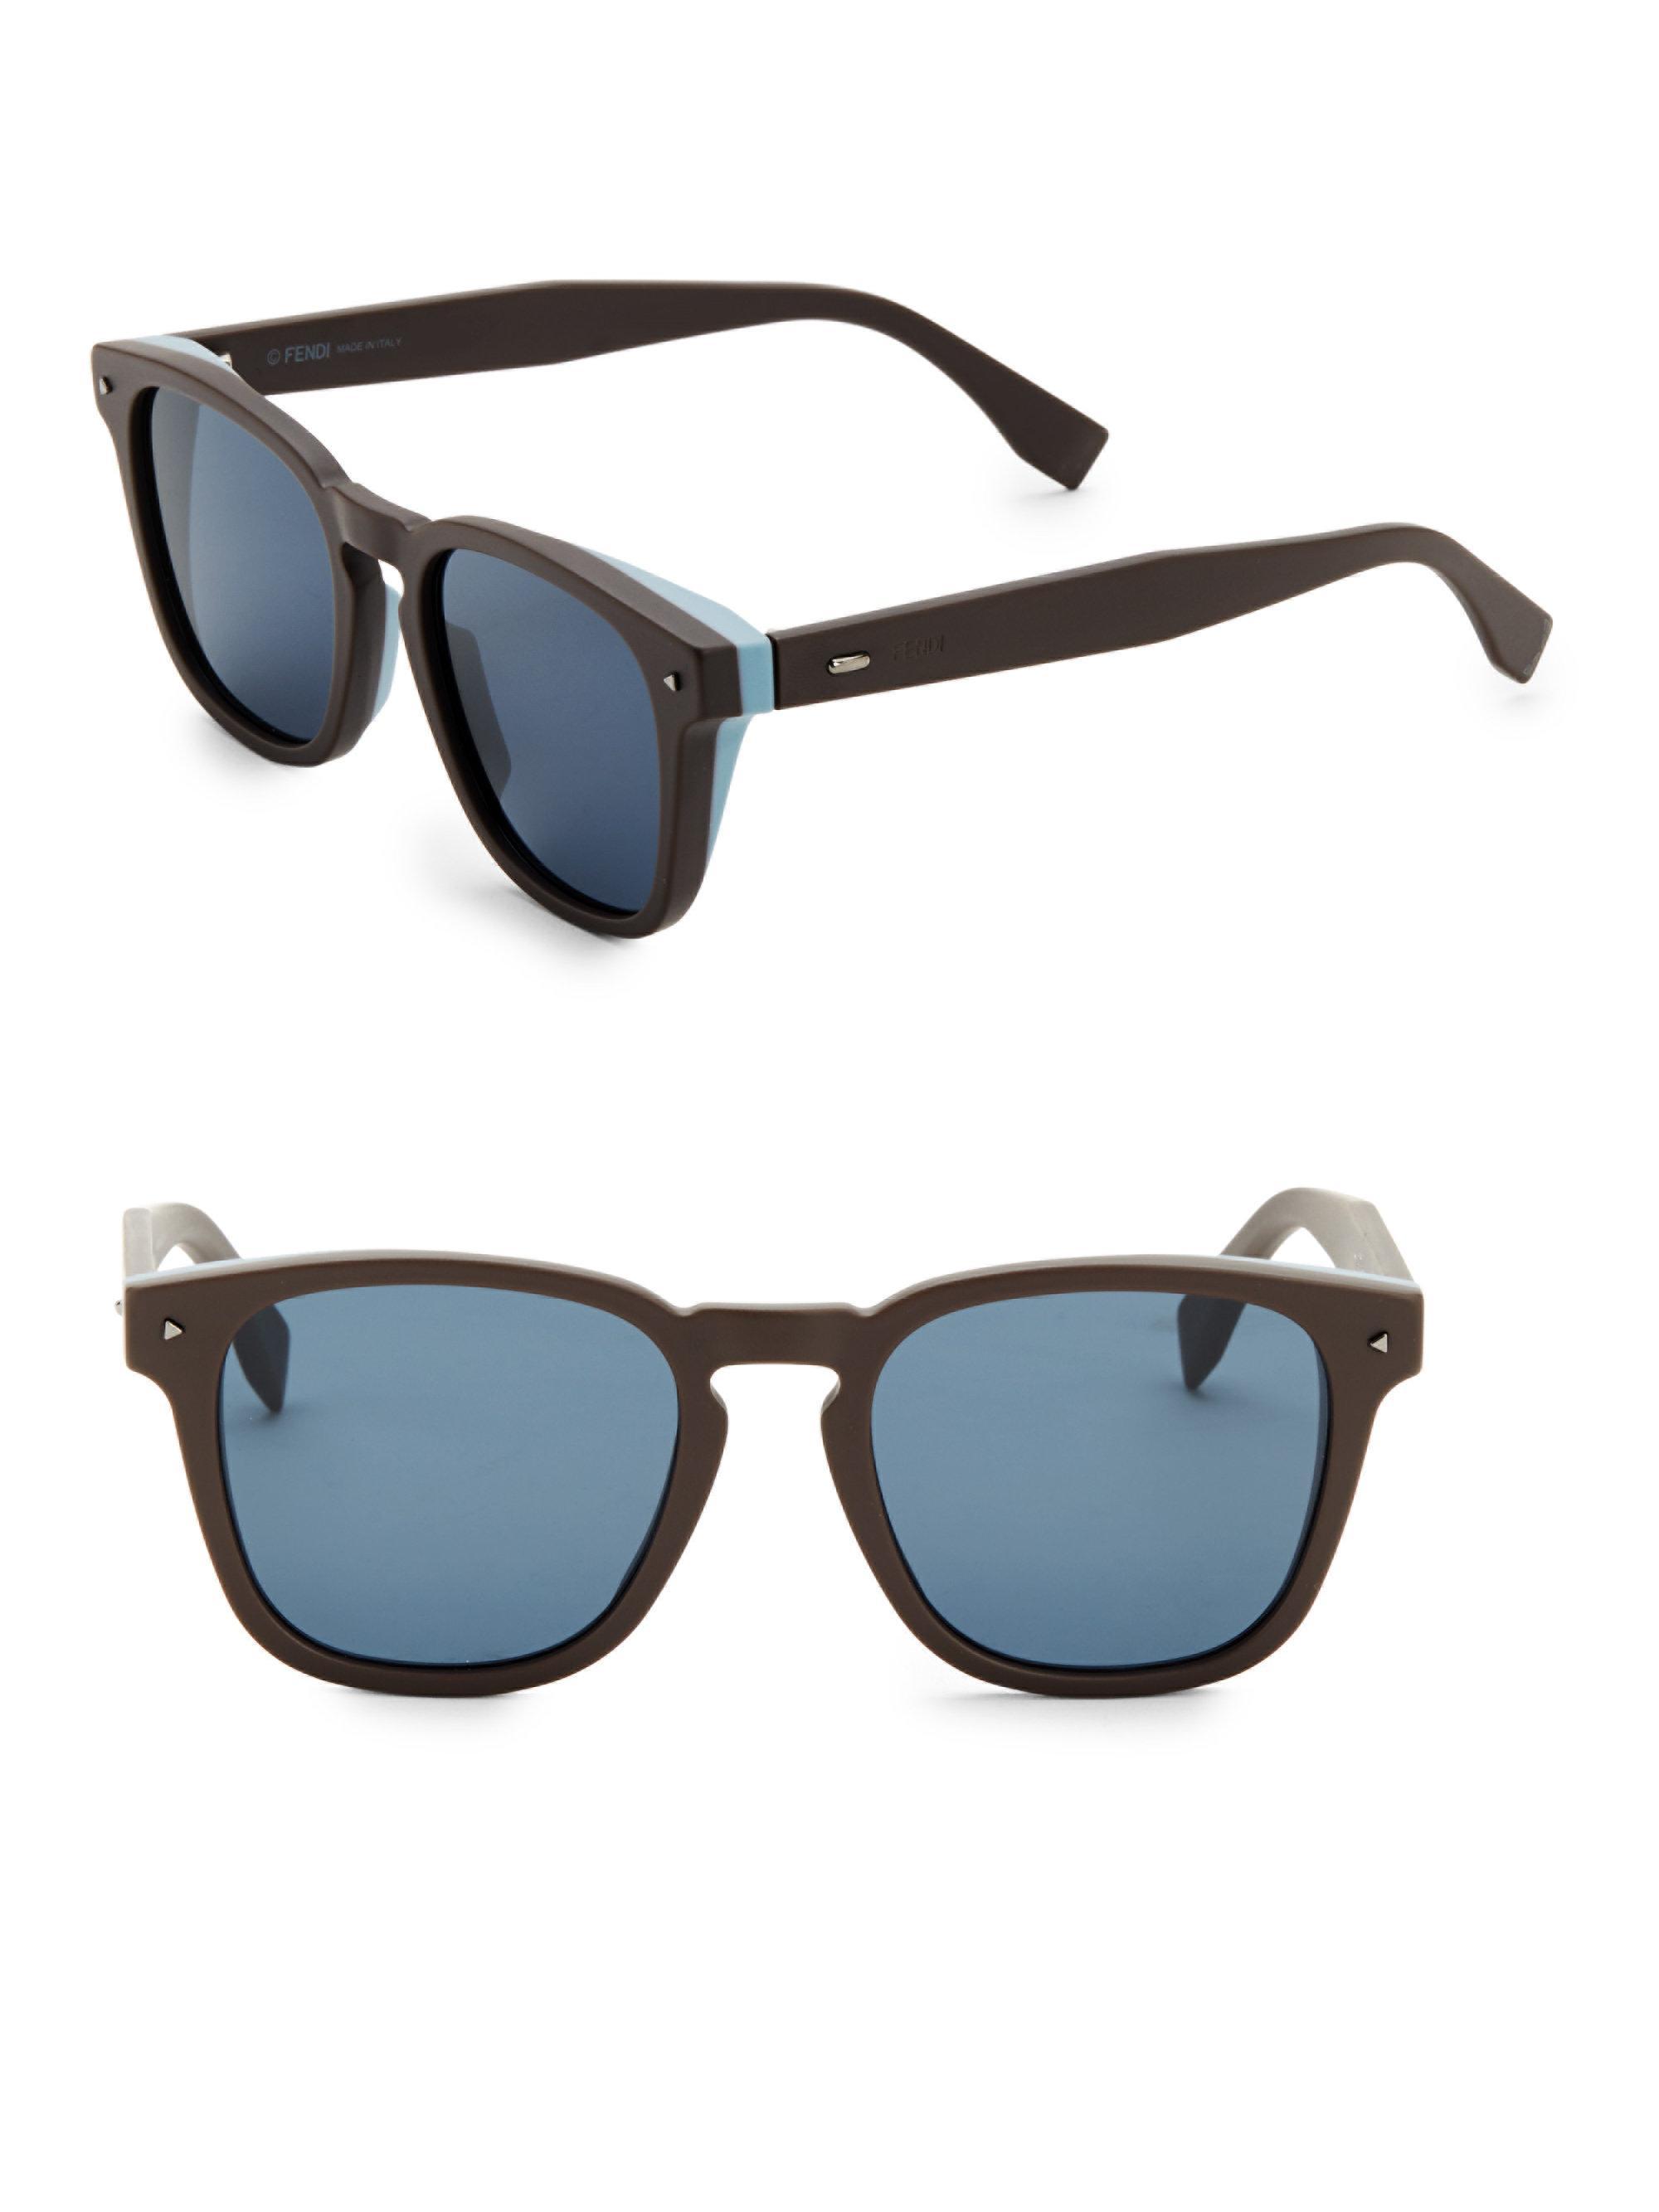 984dd4691a5 Fendi. Men s Brown 52mm Square Sunglasses.  522 From Saks Fifth Avenue